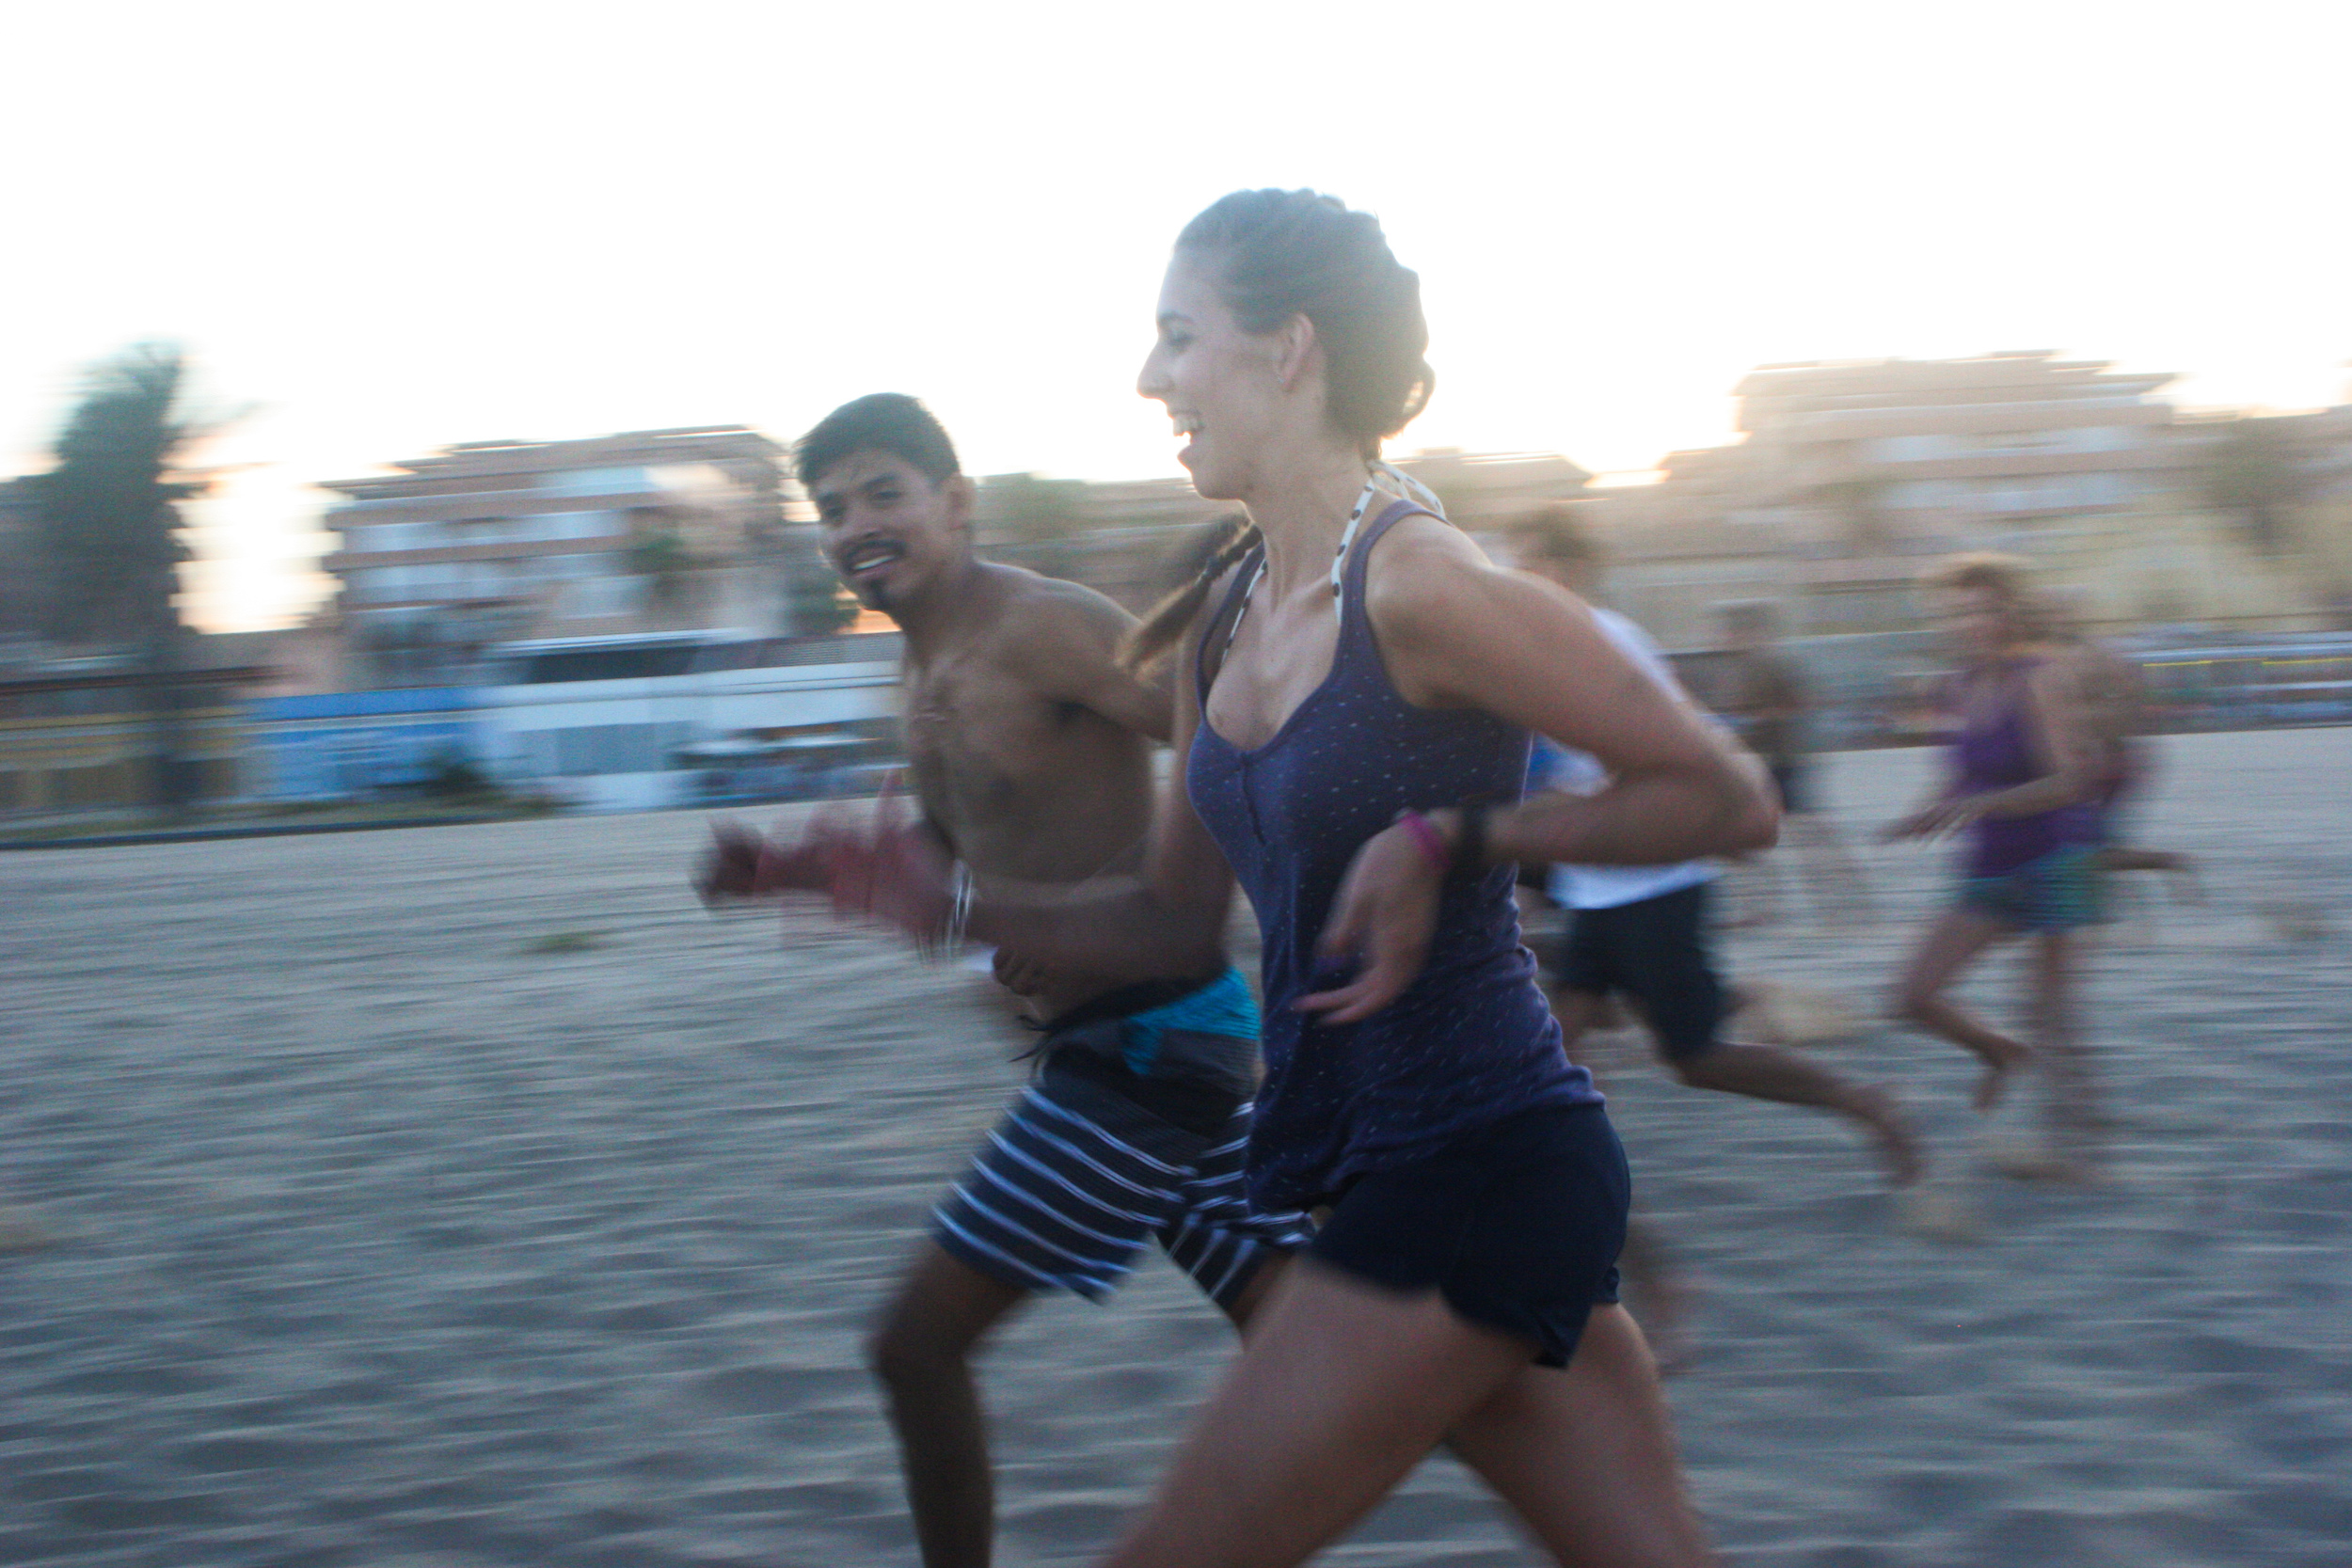 Full_CrossFit_Beach_Wod_V2_2015-10.jpg